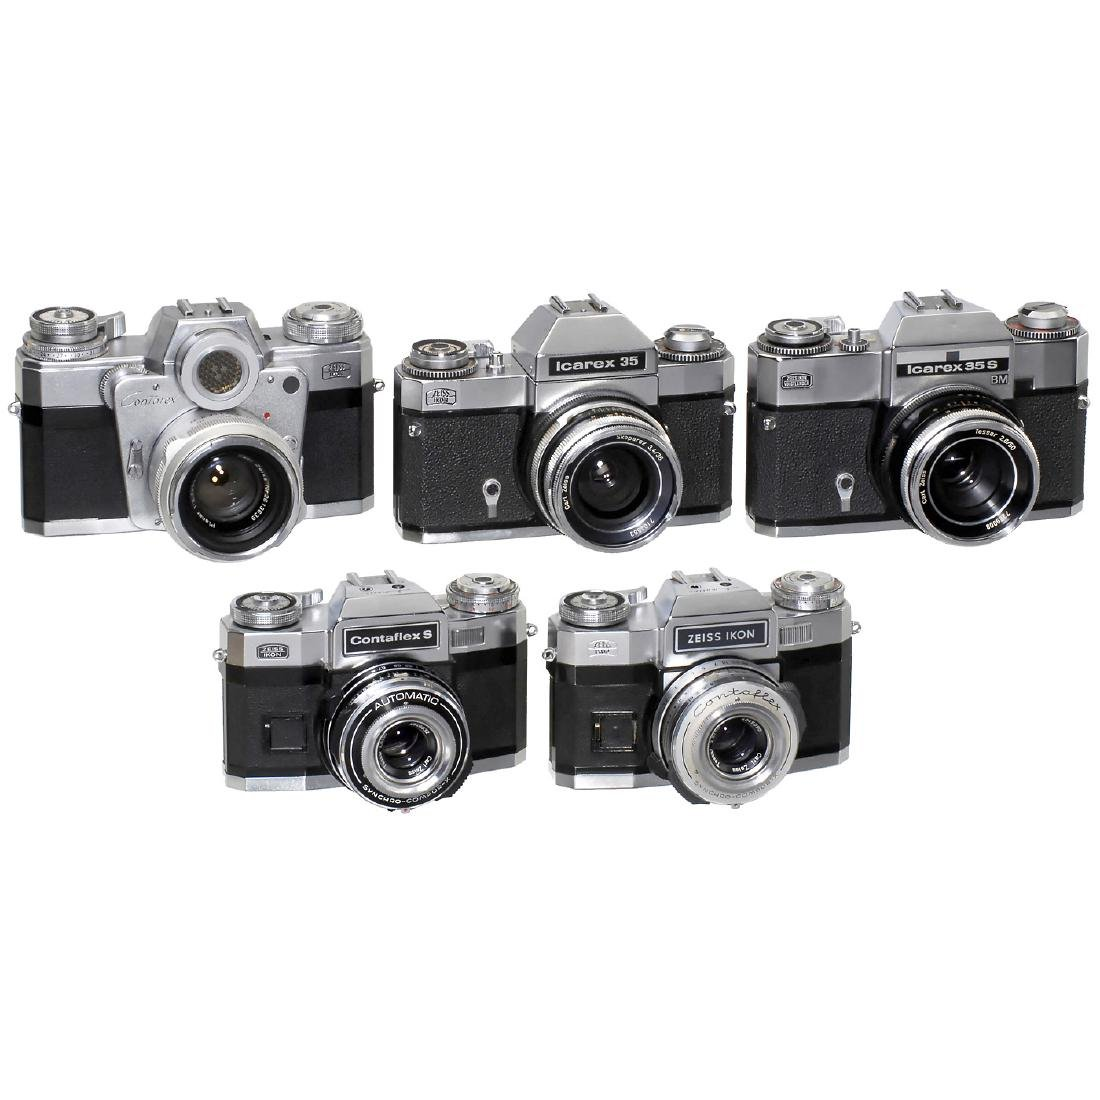 5 Zeiss Ikon SLR Cameras